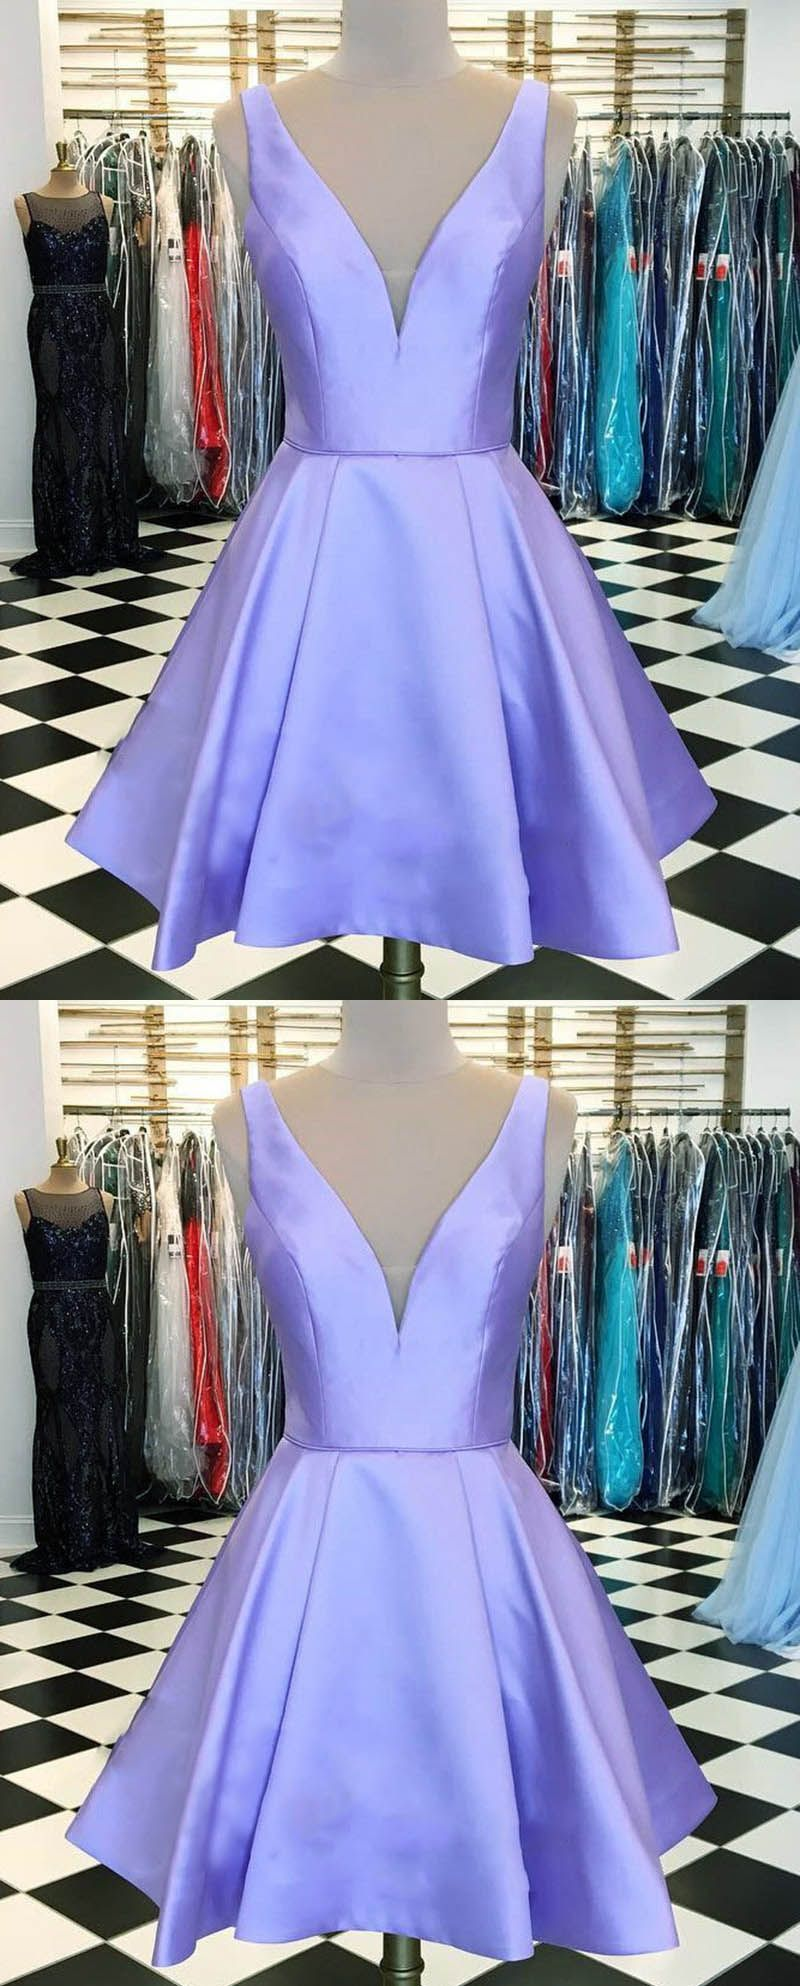 V neck lavender homecoming prom dresses short sp in prom